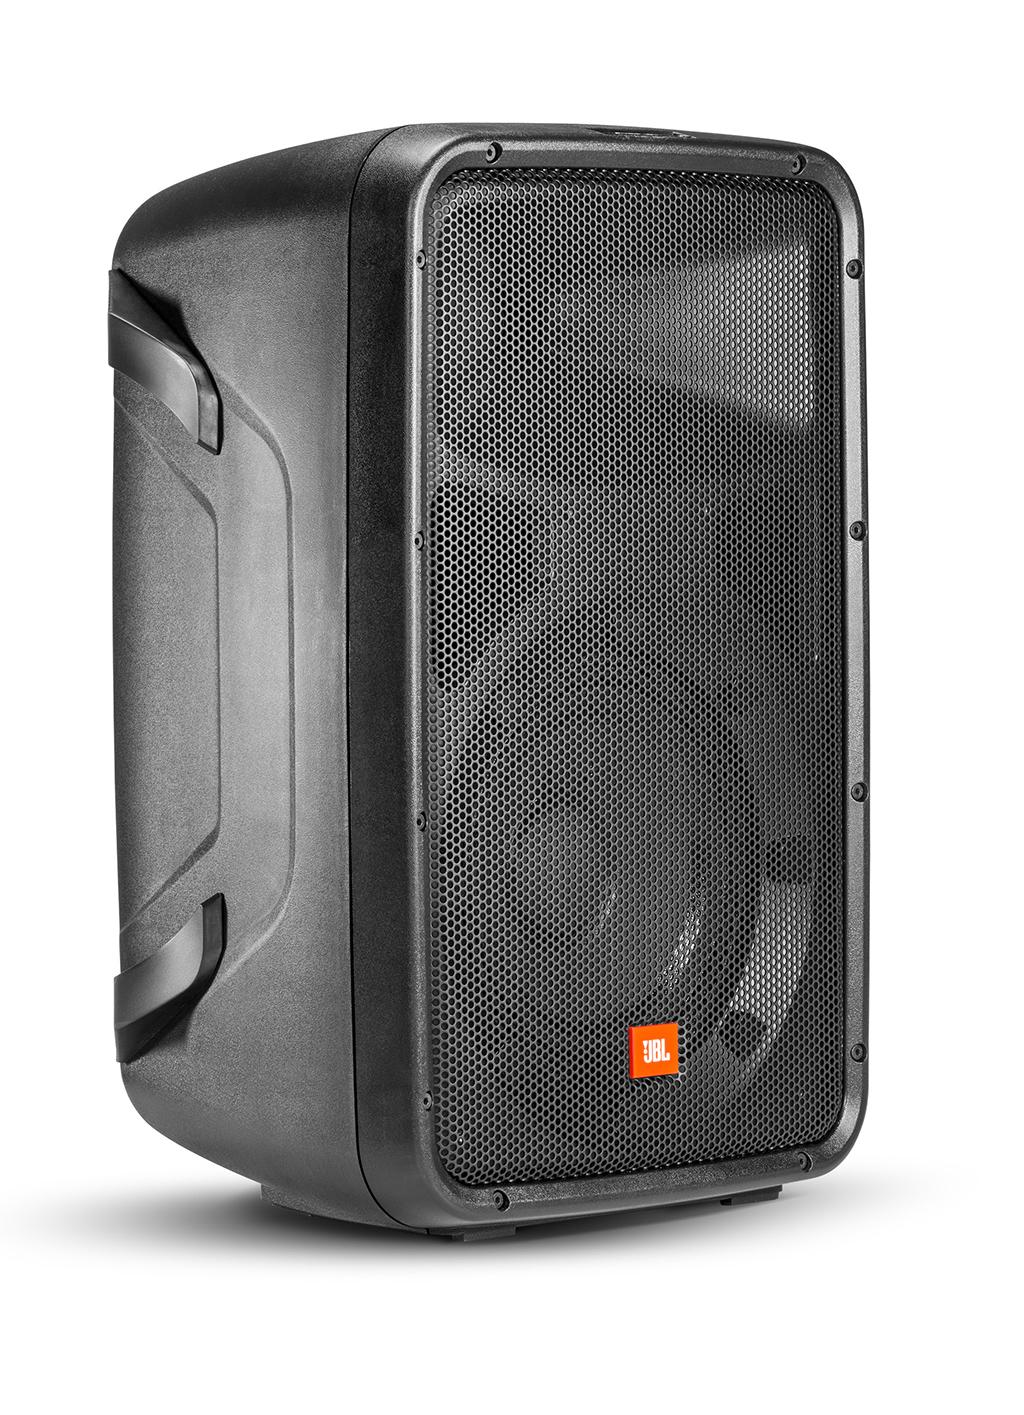 JBL EON208P: portable PA system for entertainment